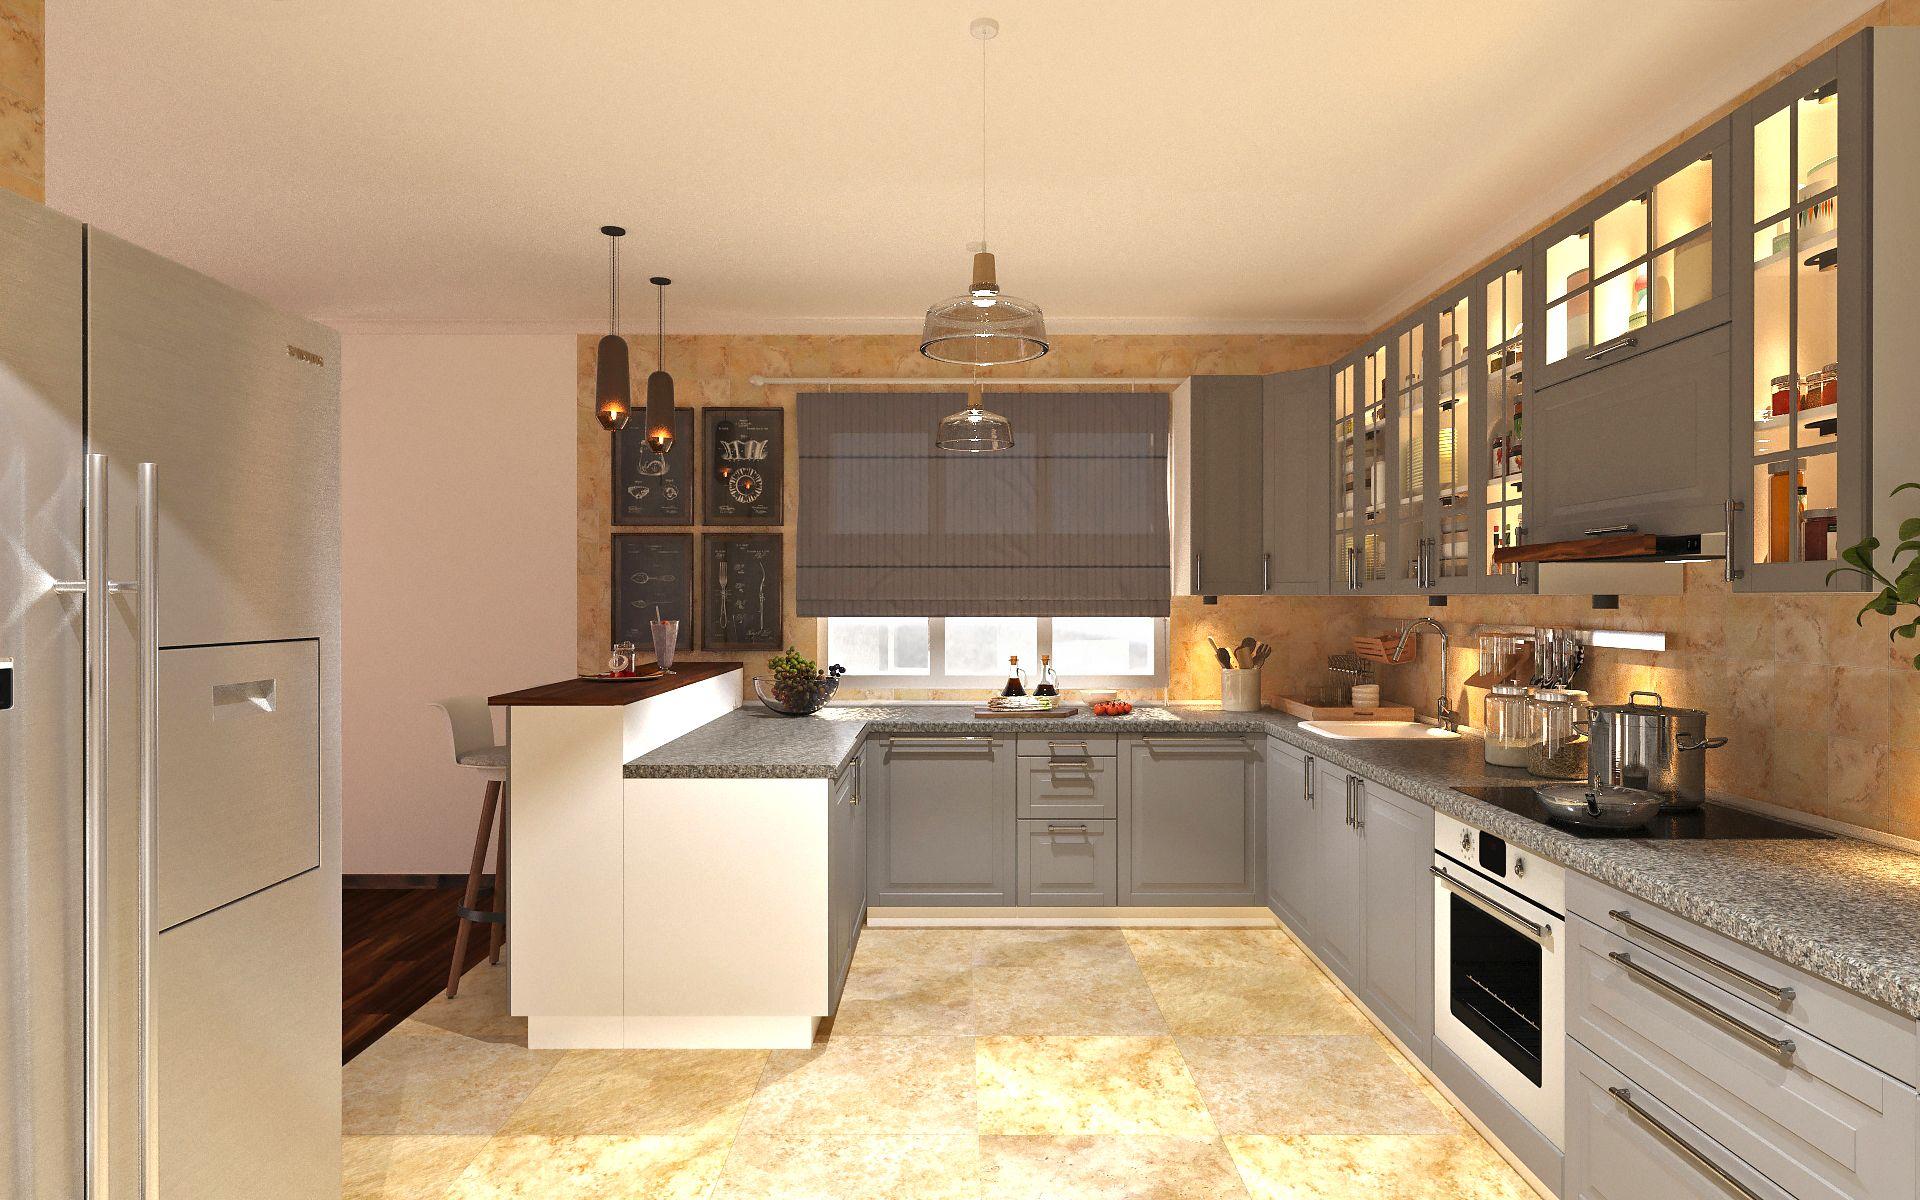 Kitchen Design 3ds Max Corona Renderer Ikea Kitchen